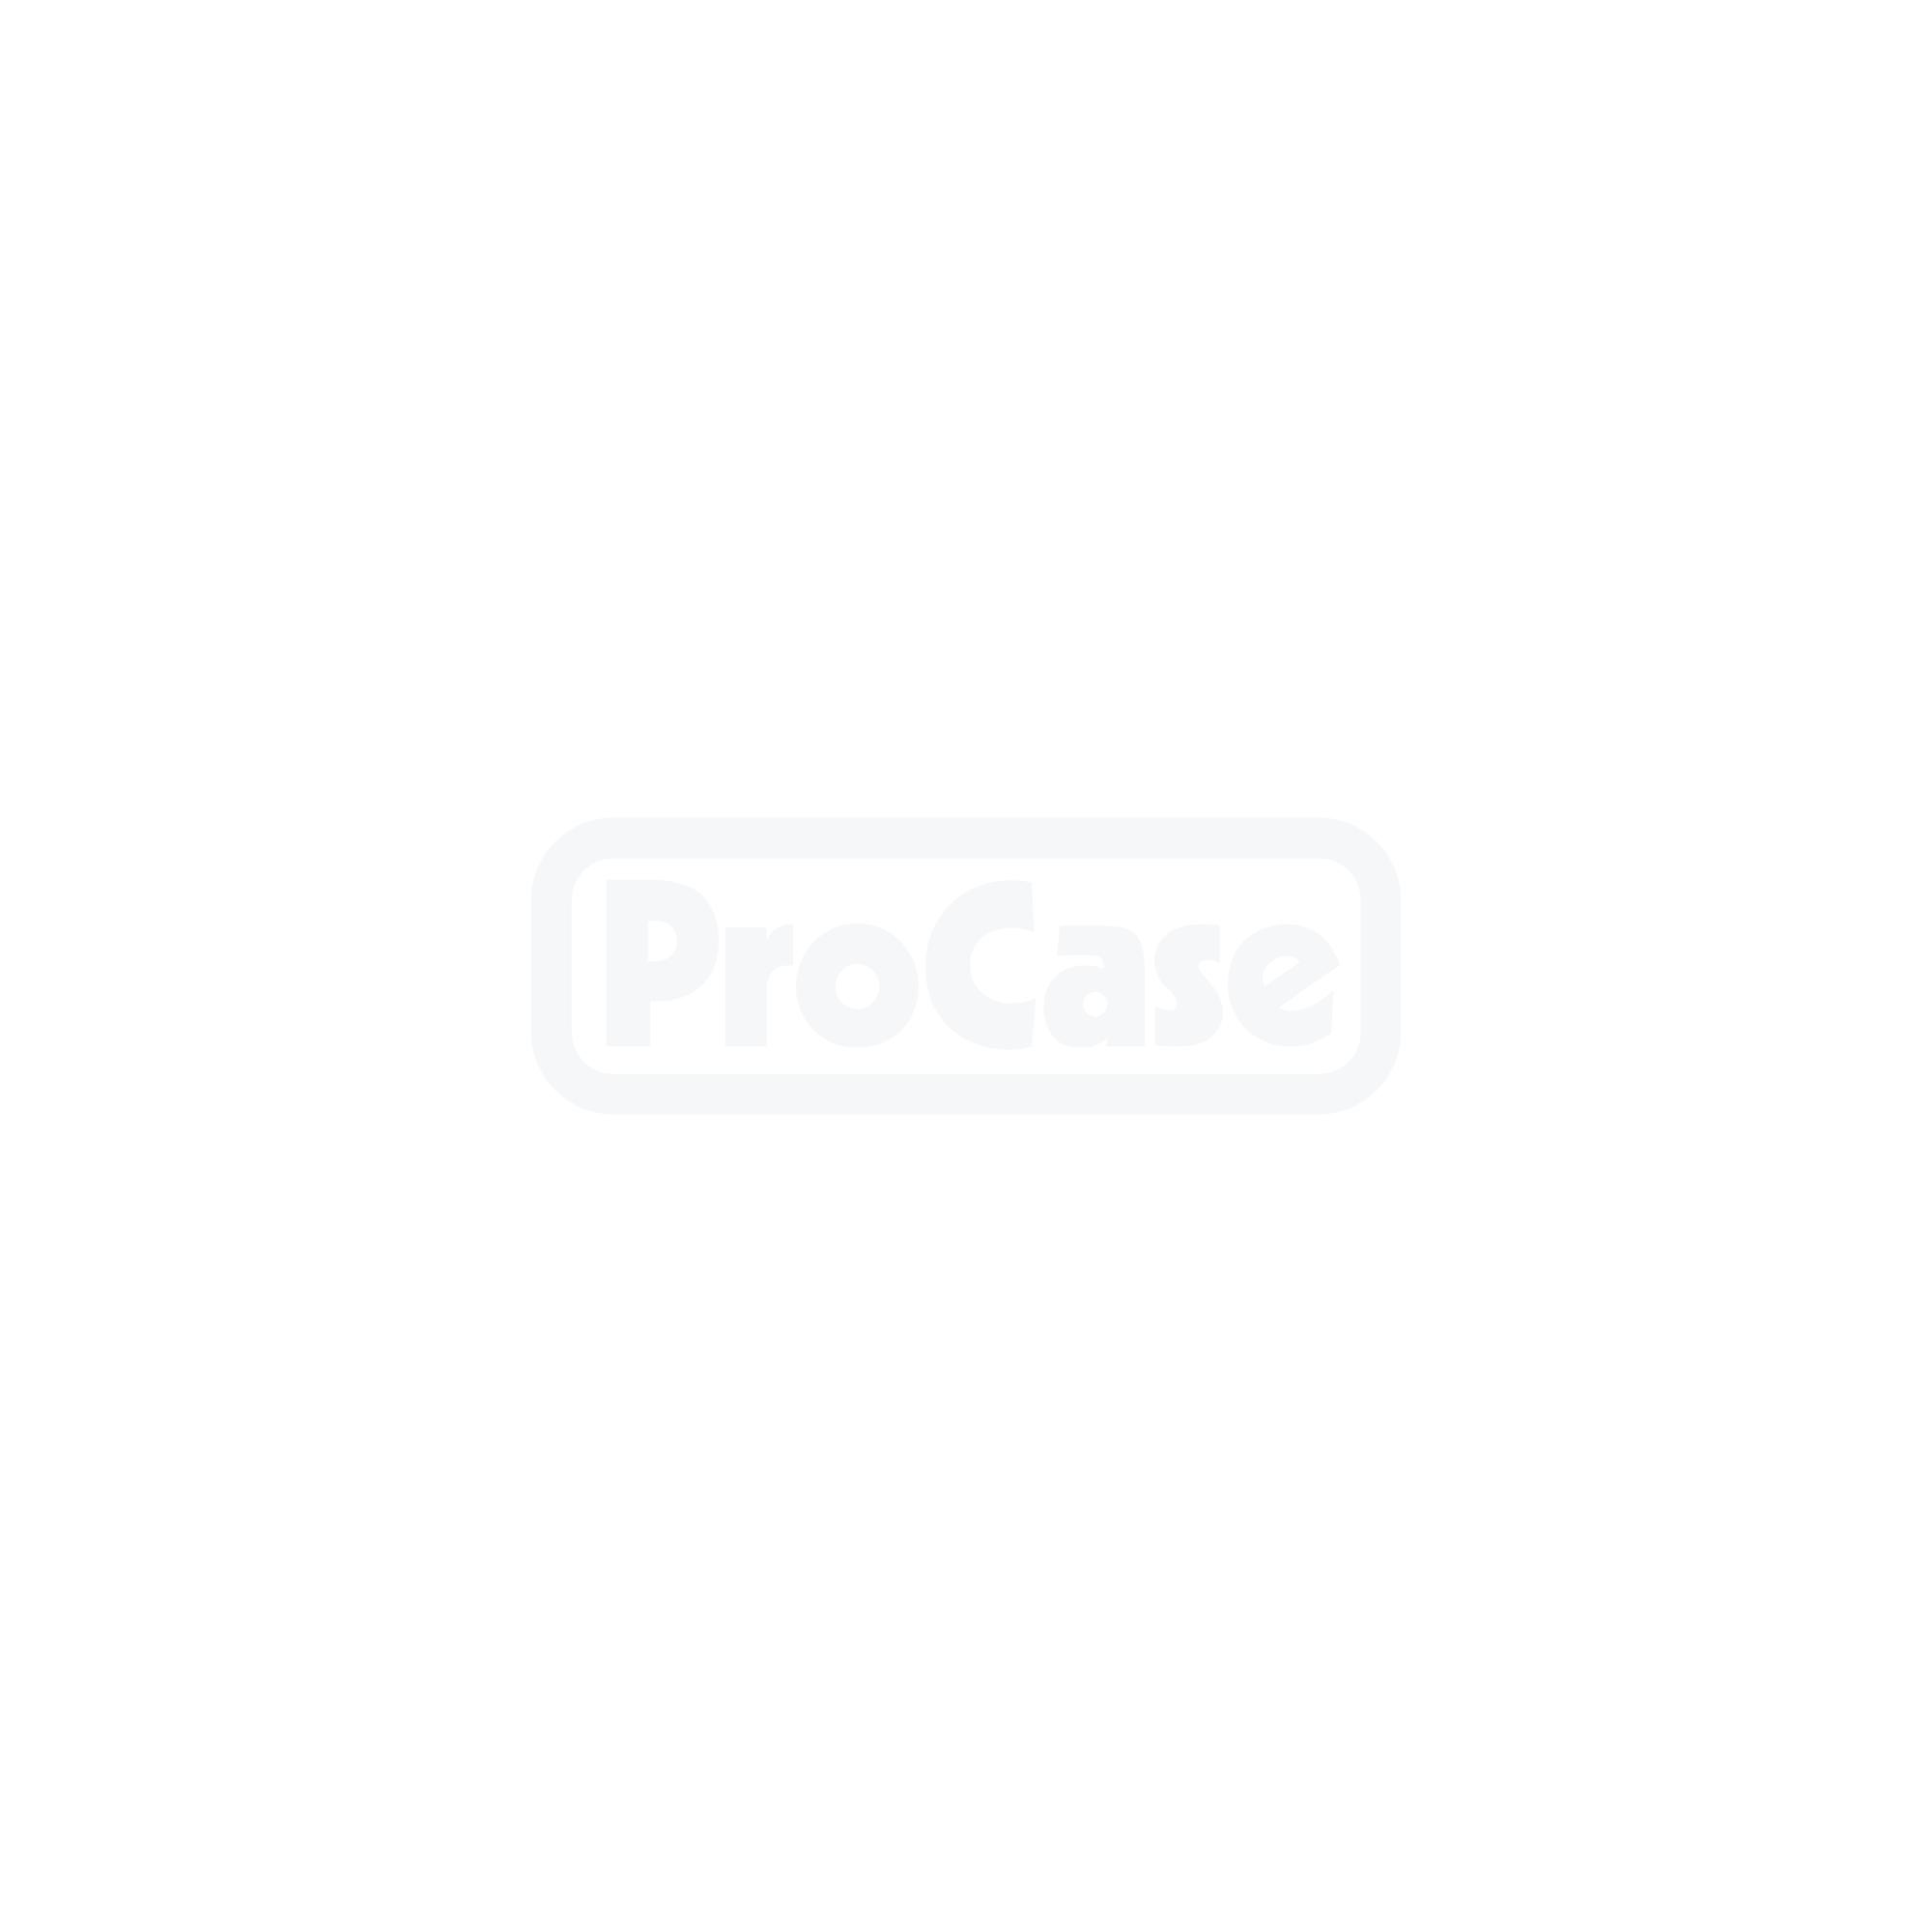 Rampencase für Alpha Omega MicroGuide Pro